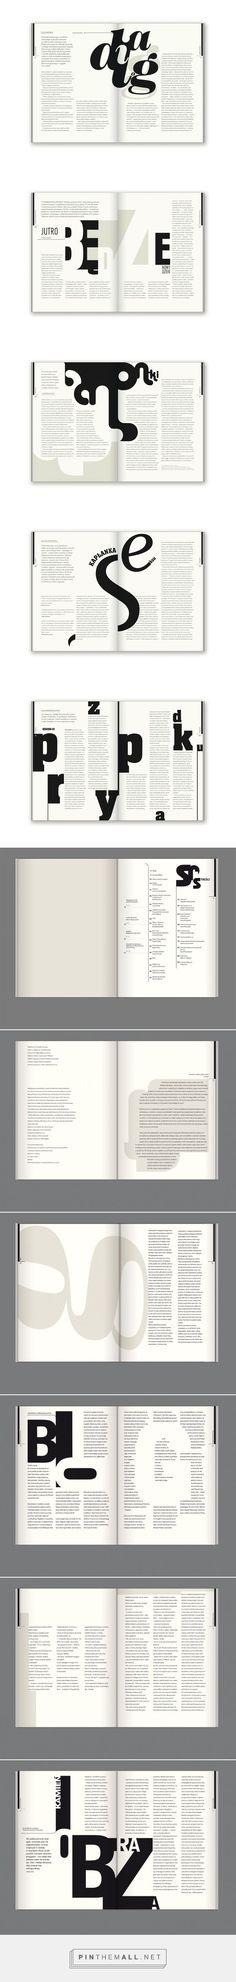 Editorial Design: Bluszcz Magazine by Smartyns